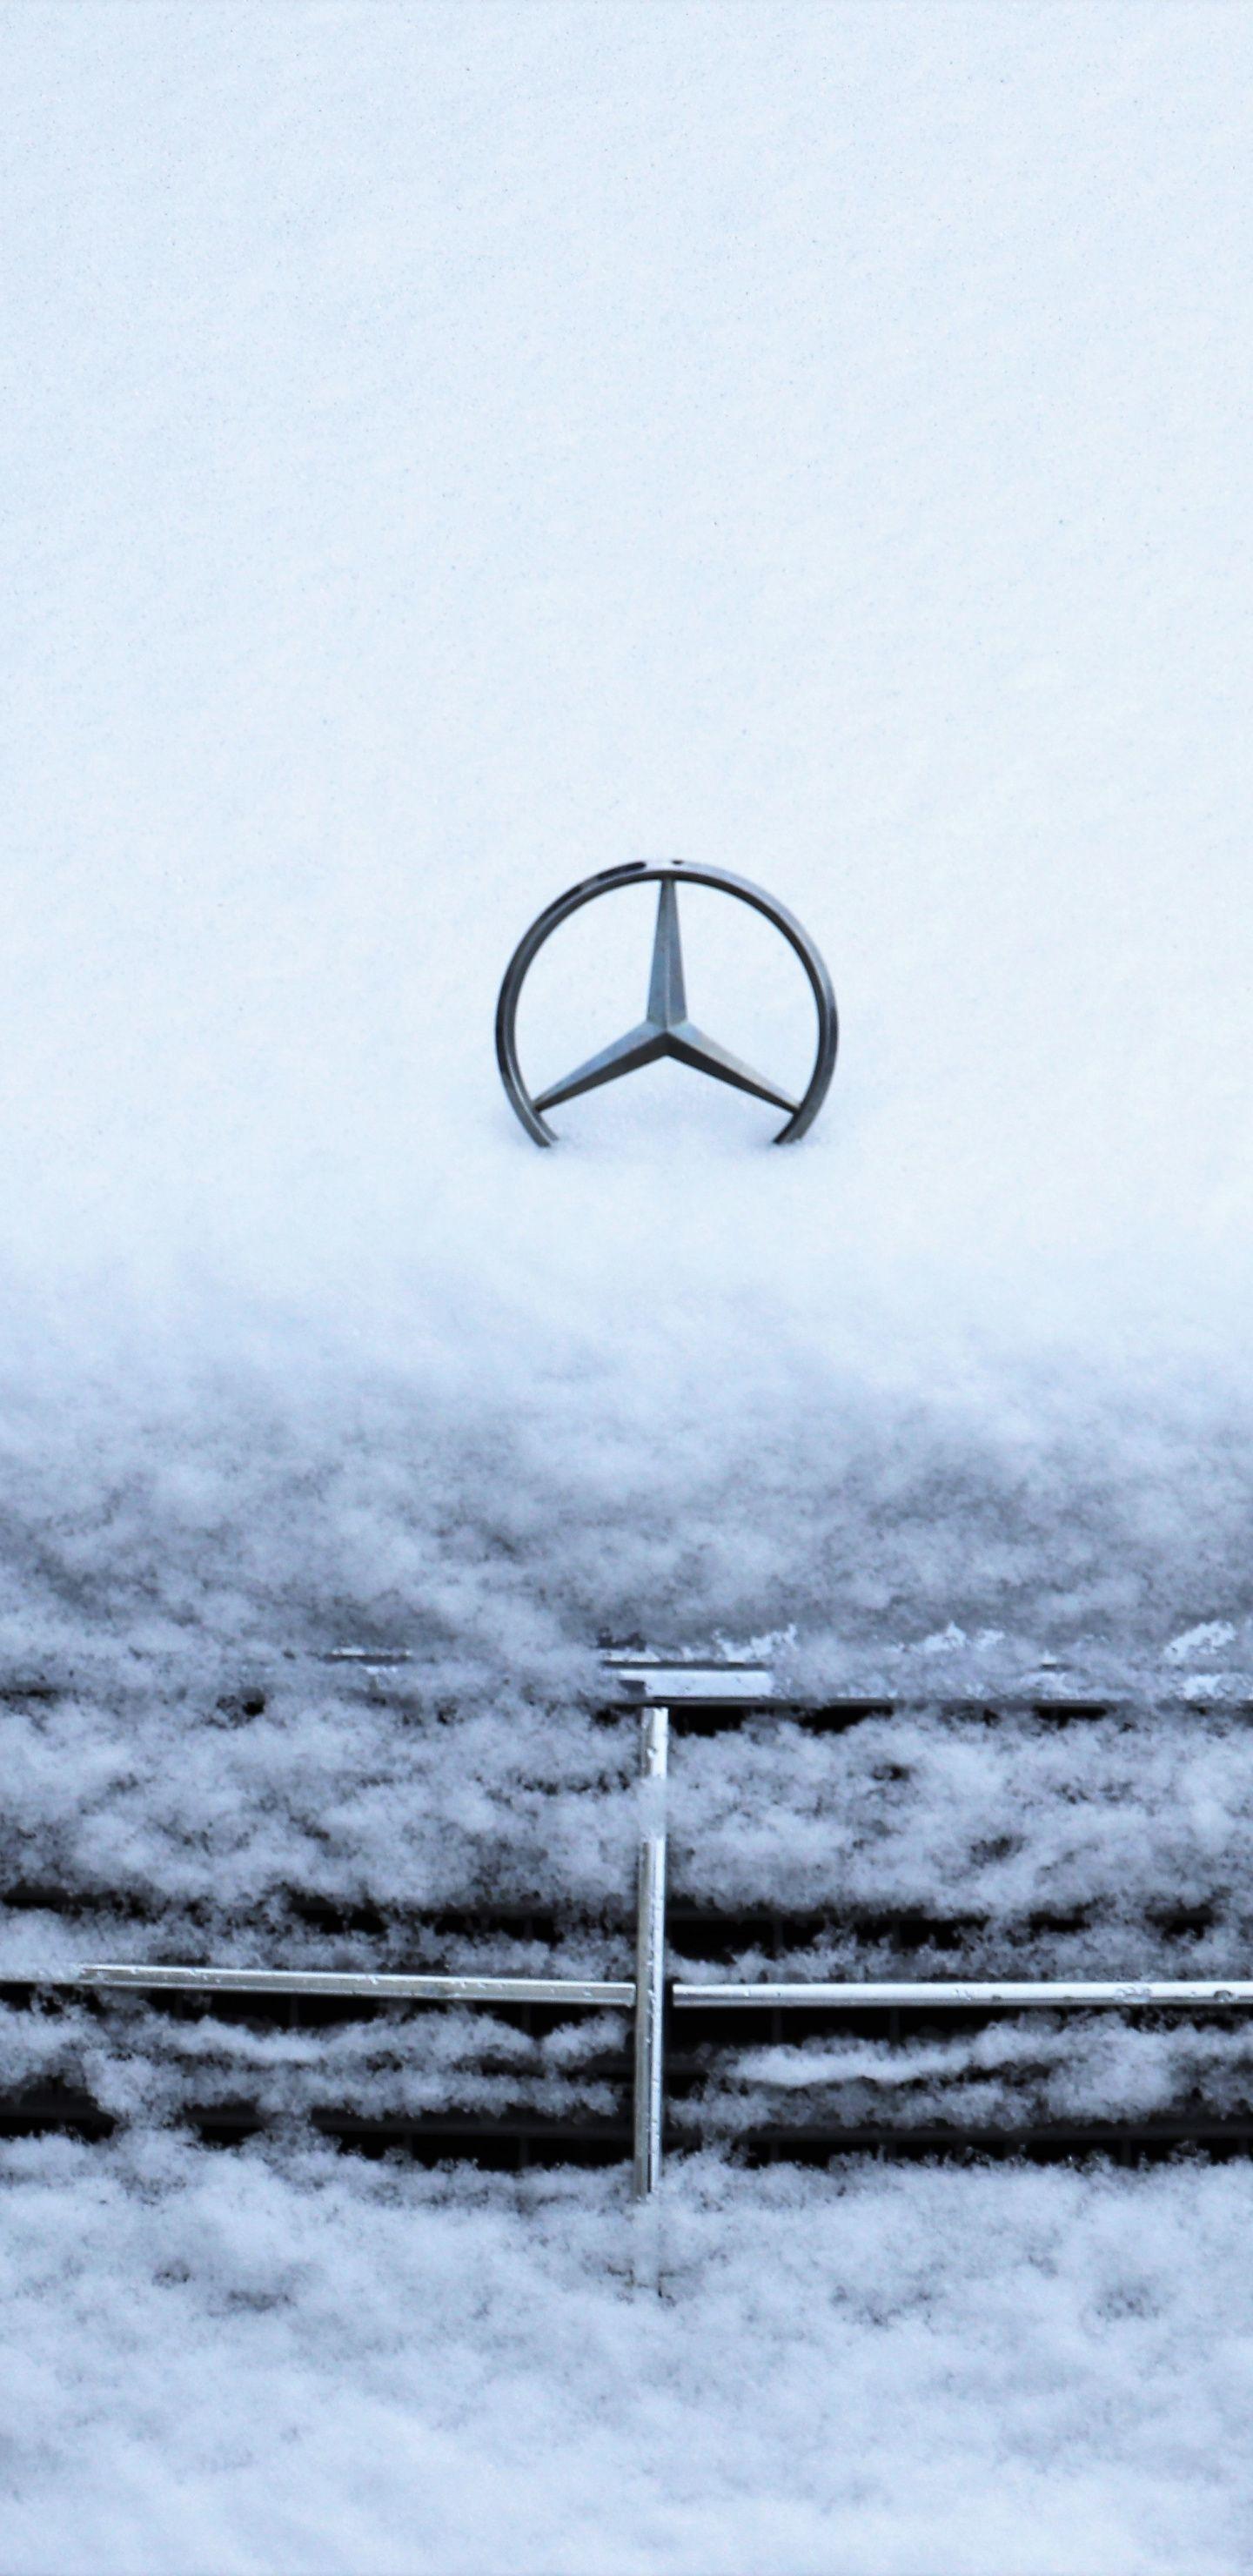 Winter Snow Layer Cars Mercedes Benz 1440x2960 Wallpaper